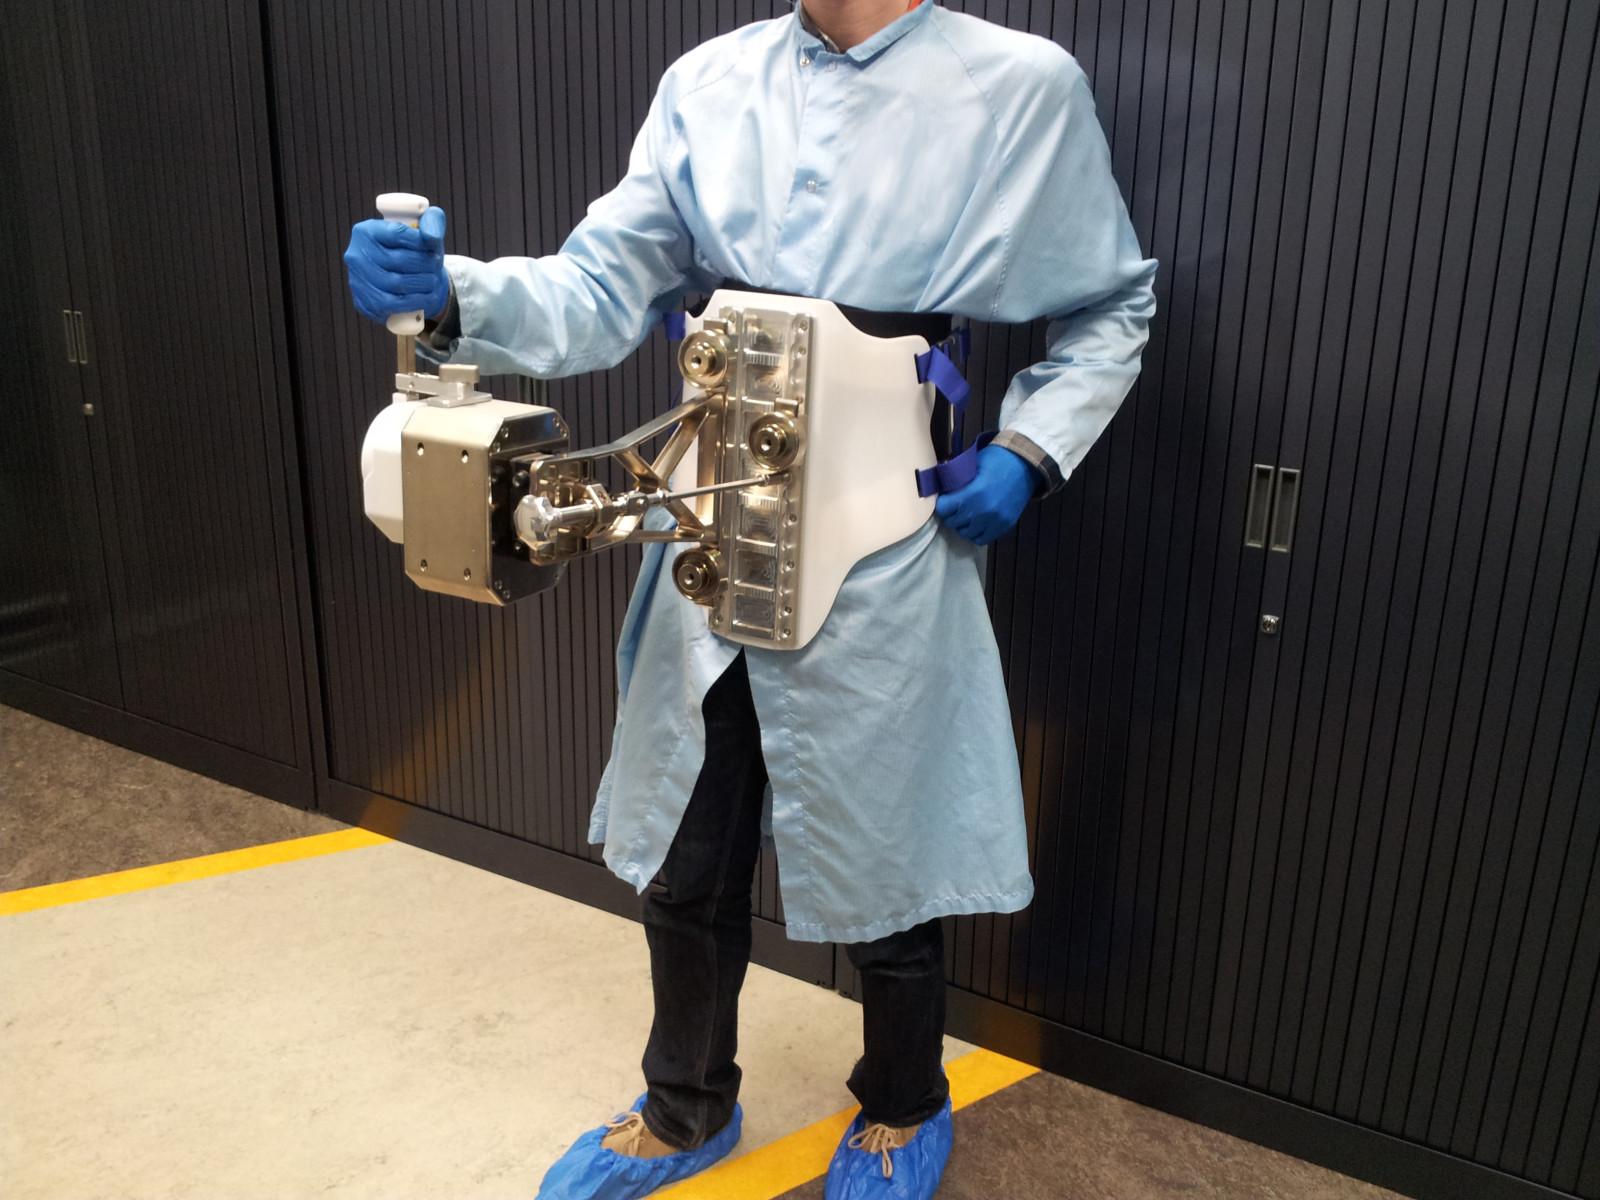 Manipulator Haptics-1 zamontowany na uprzęży operatora / Credit: ESA